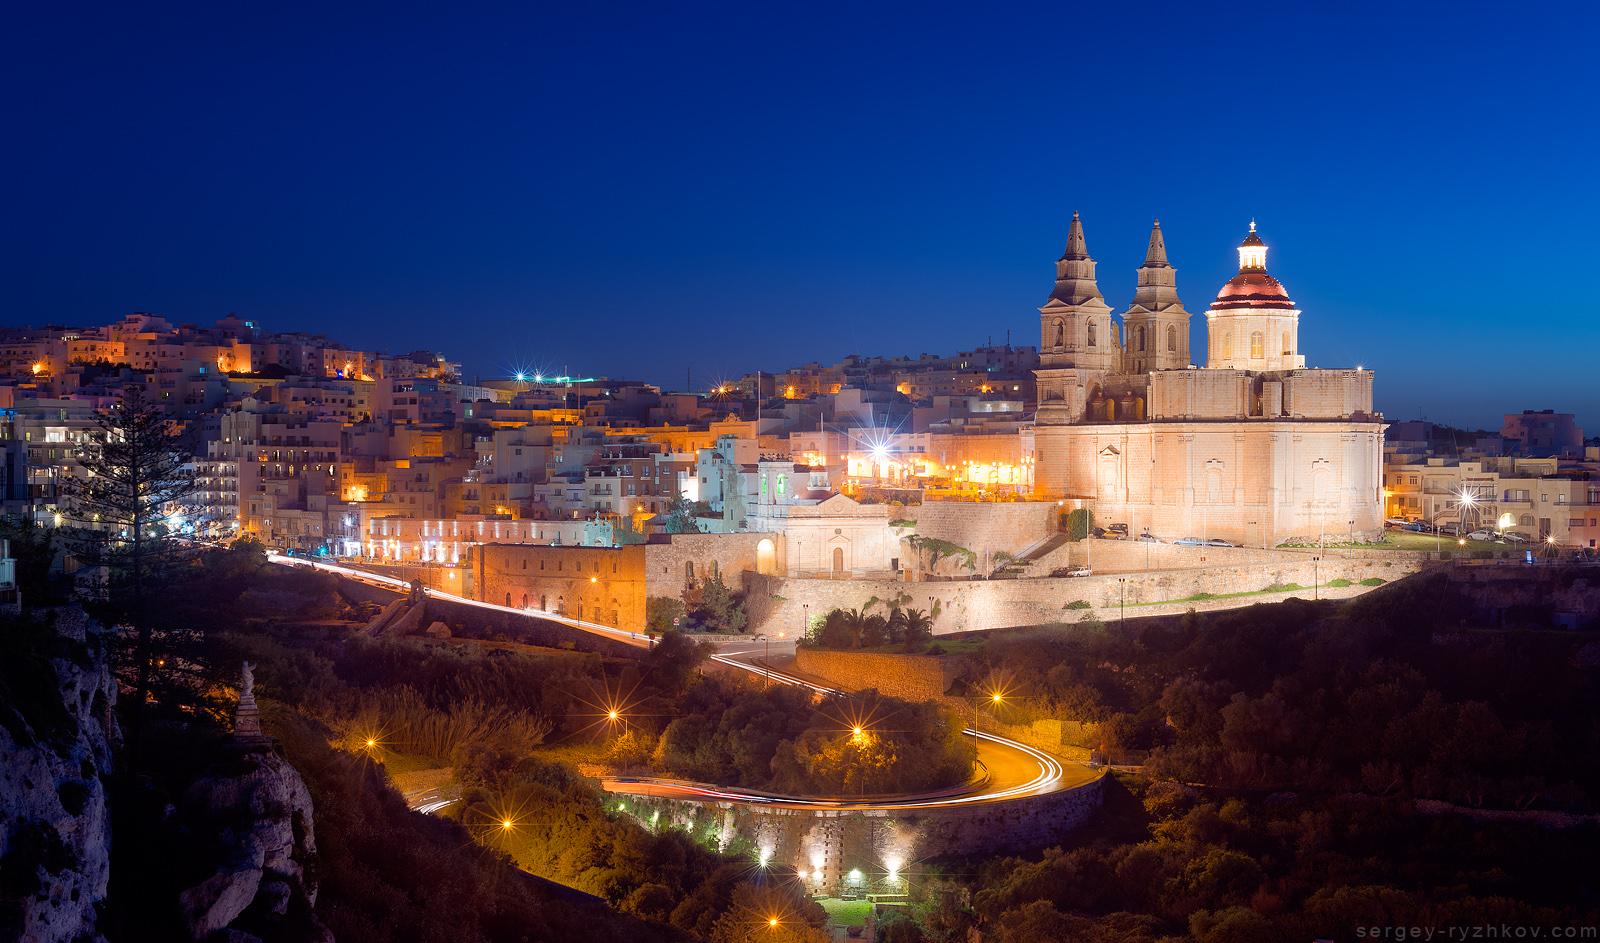 Il-Mellieha in the evening. Malta by Sergey-Ryzhkov